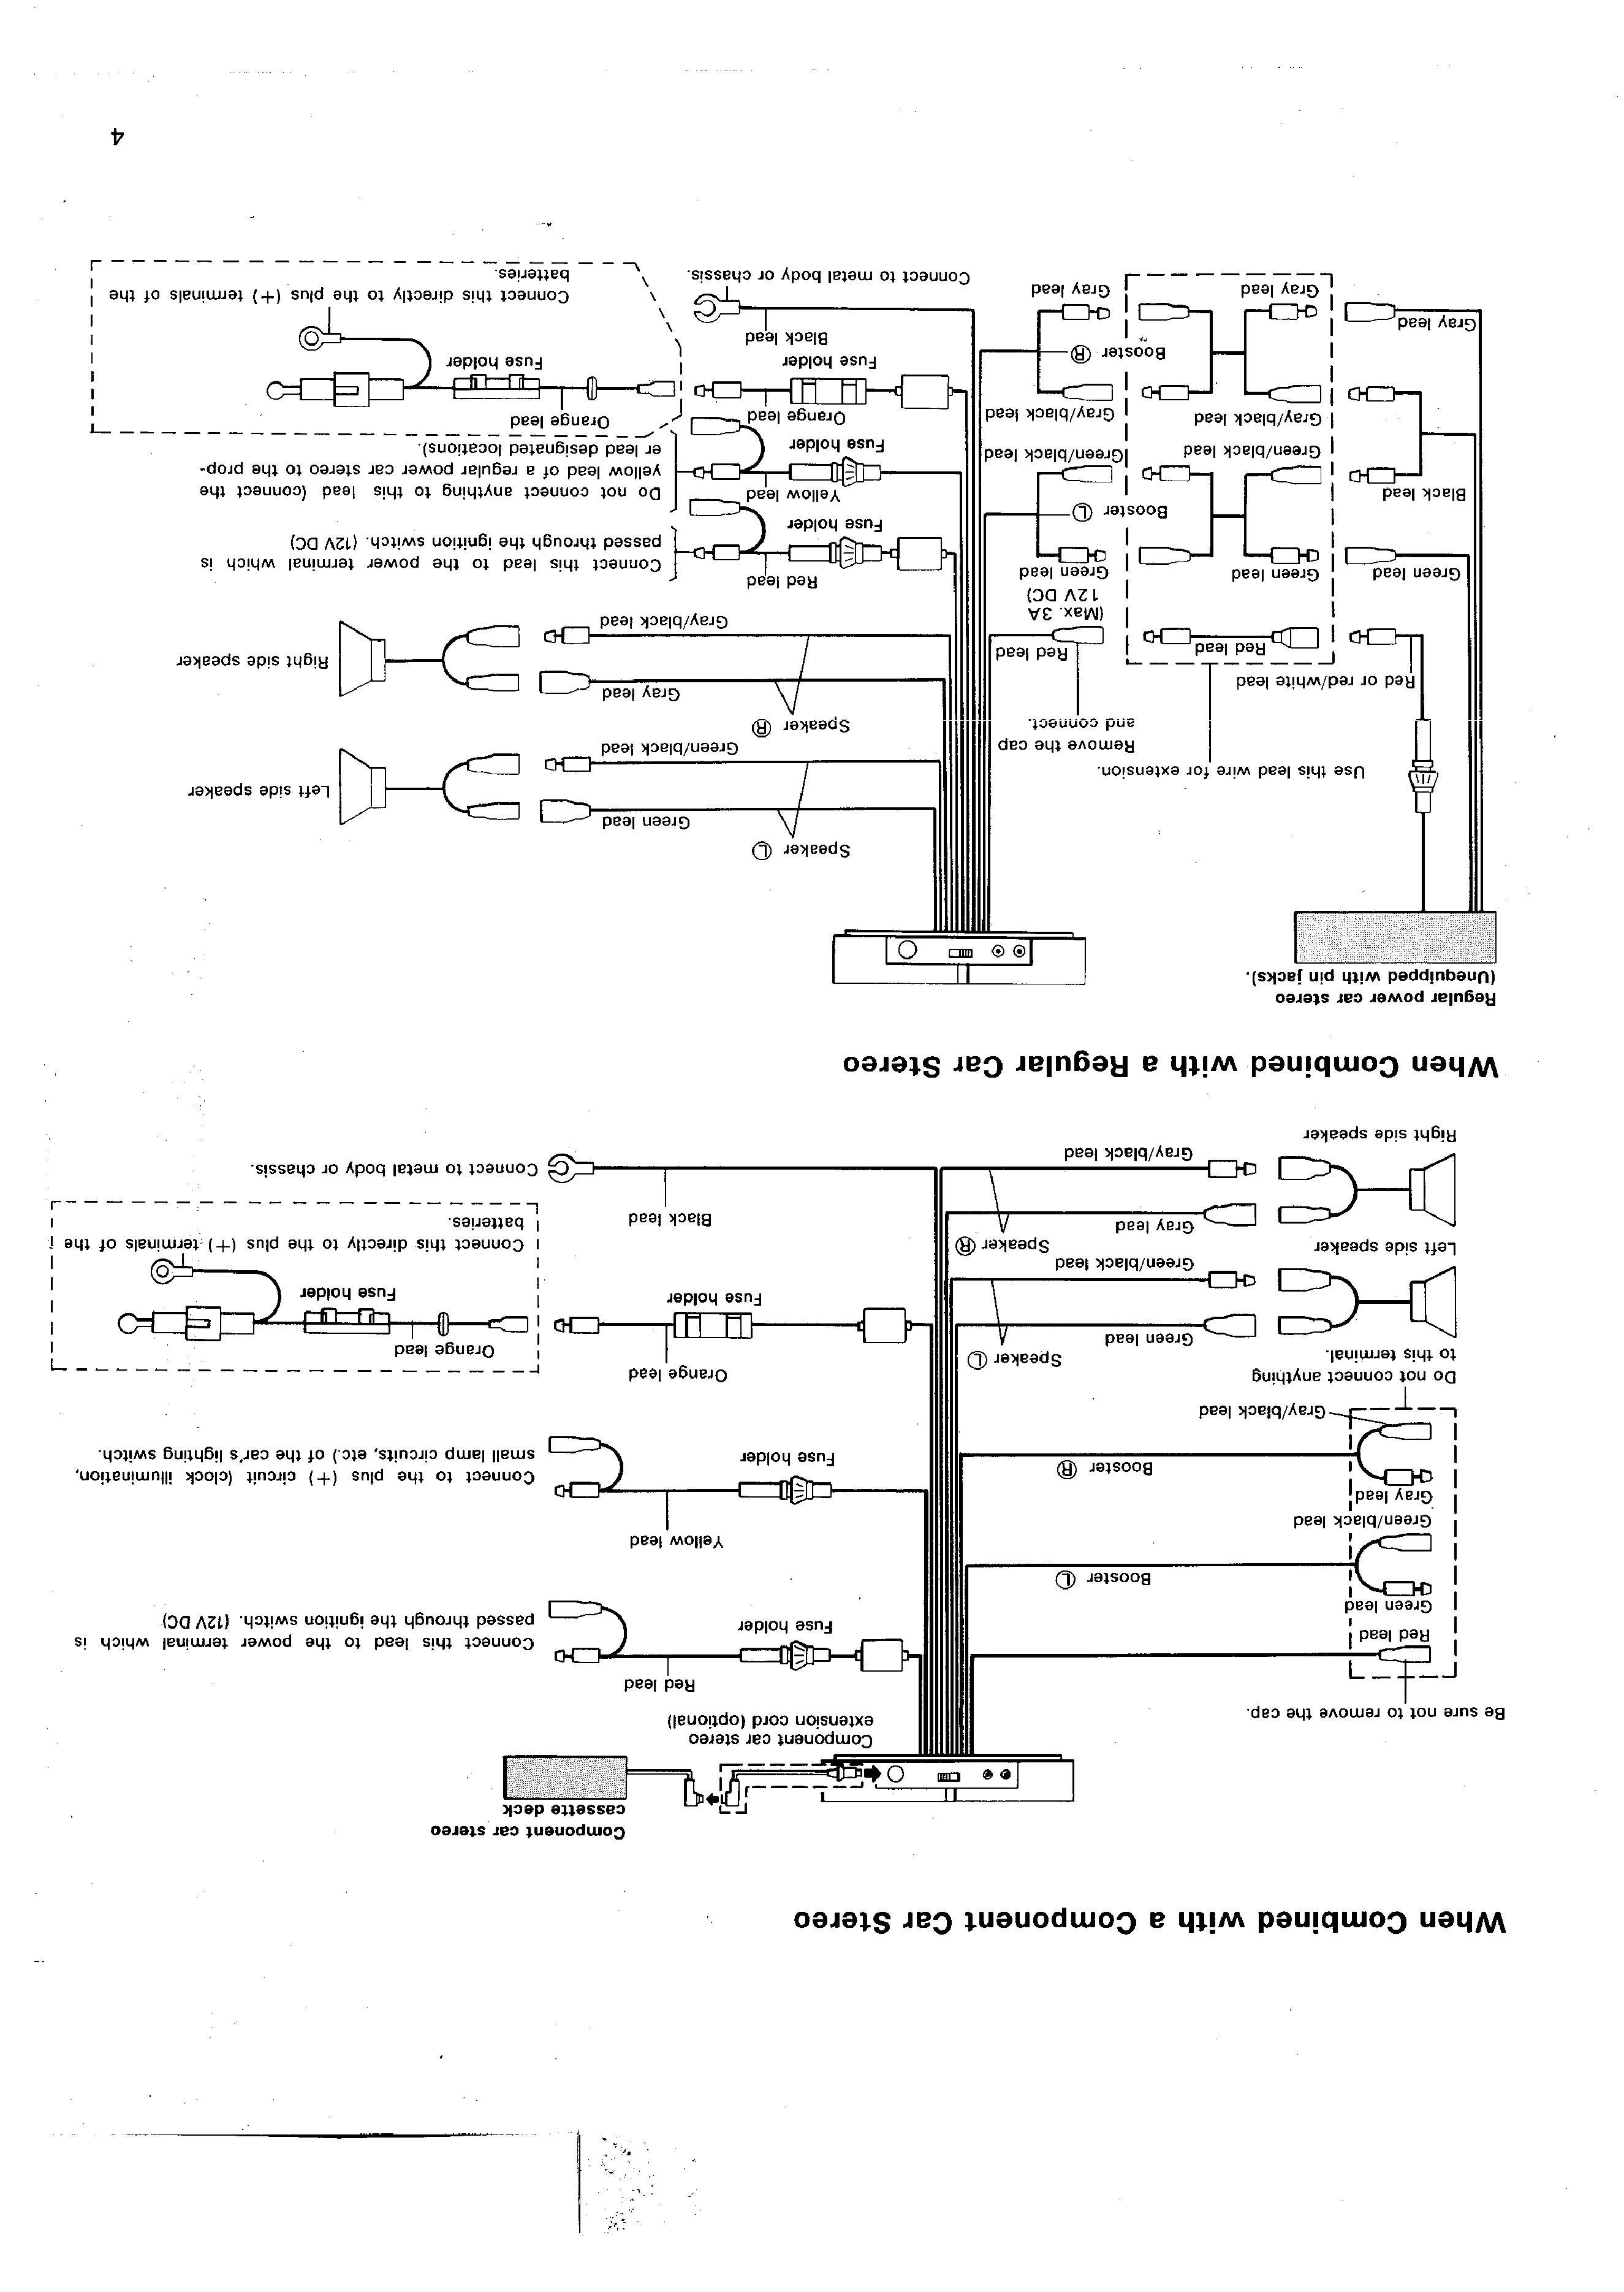 Diagram Pioneer Deh Wiring Diagram 425 Full Version Hd Quality Diagram 425 Diagramsteach Piola Libreria It